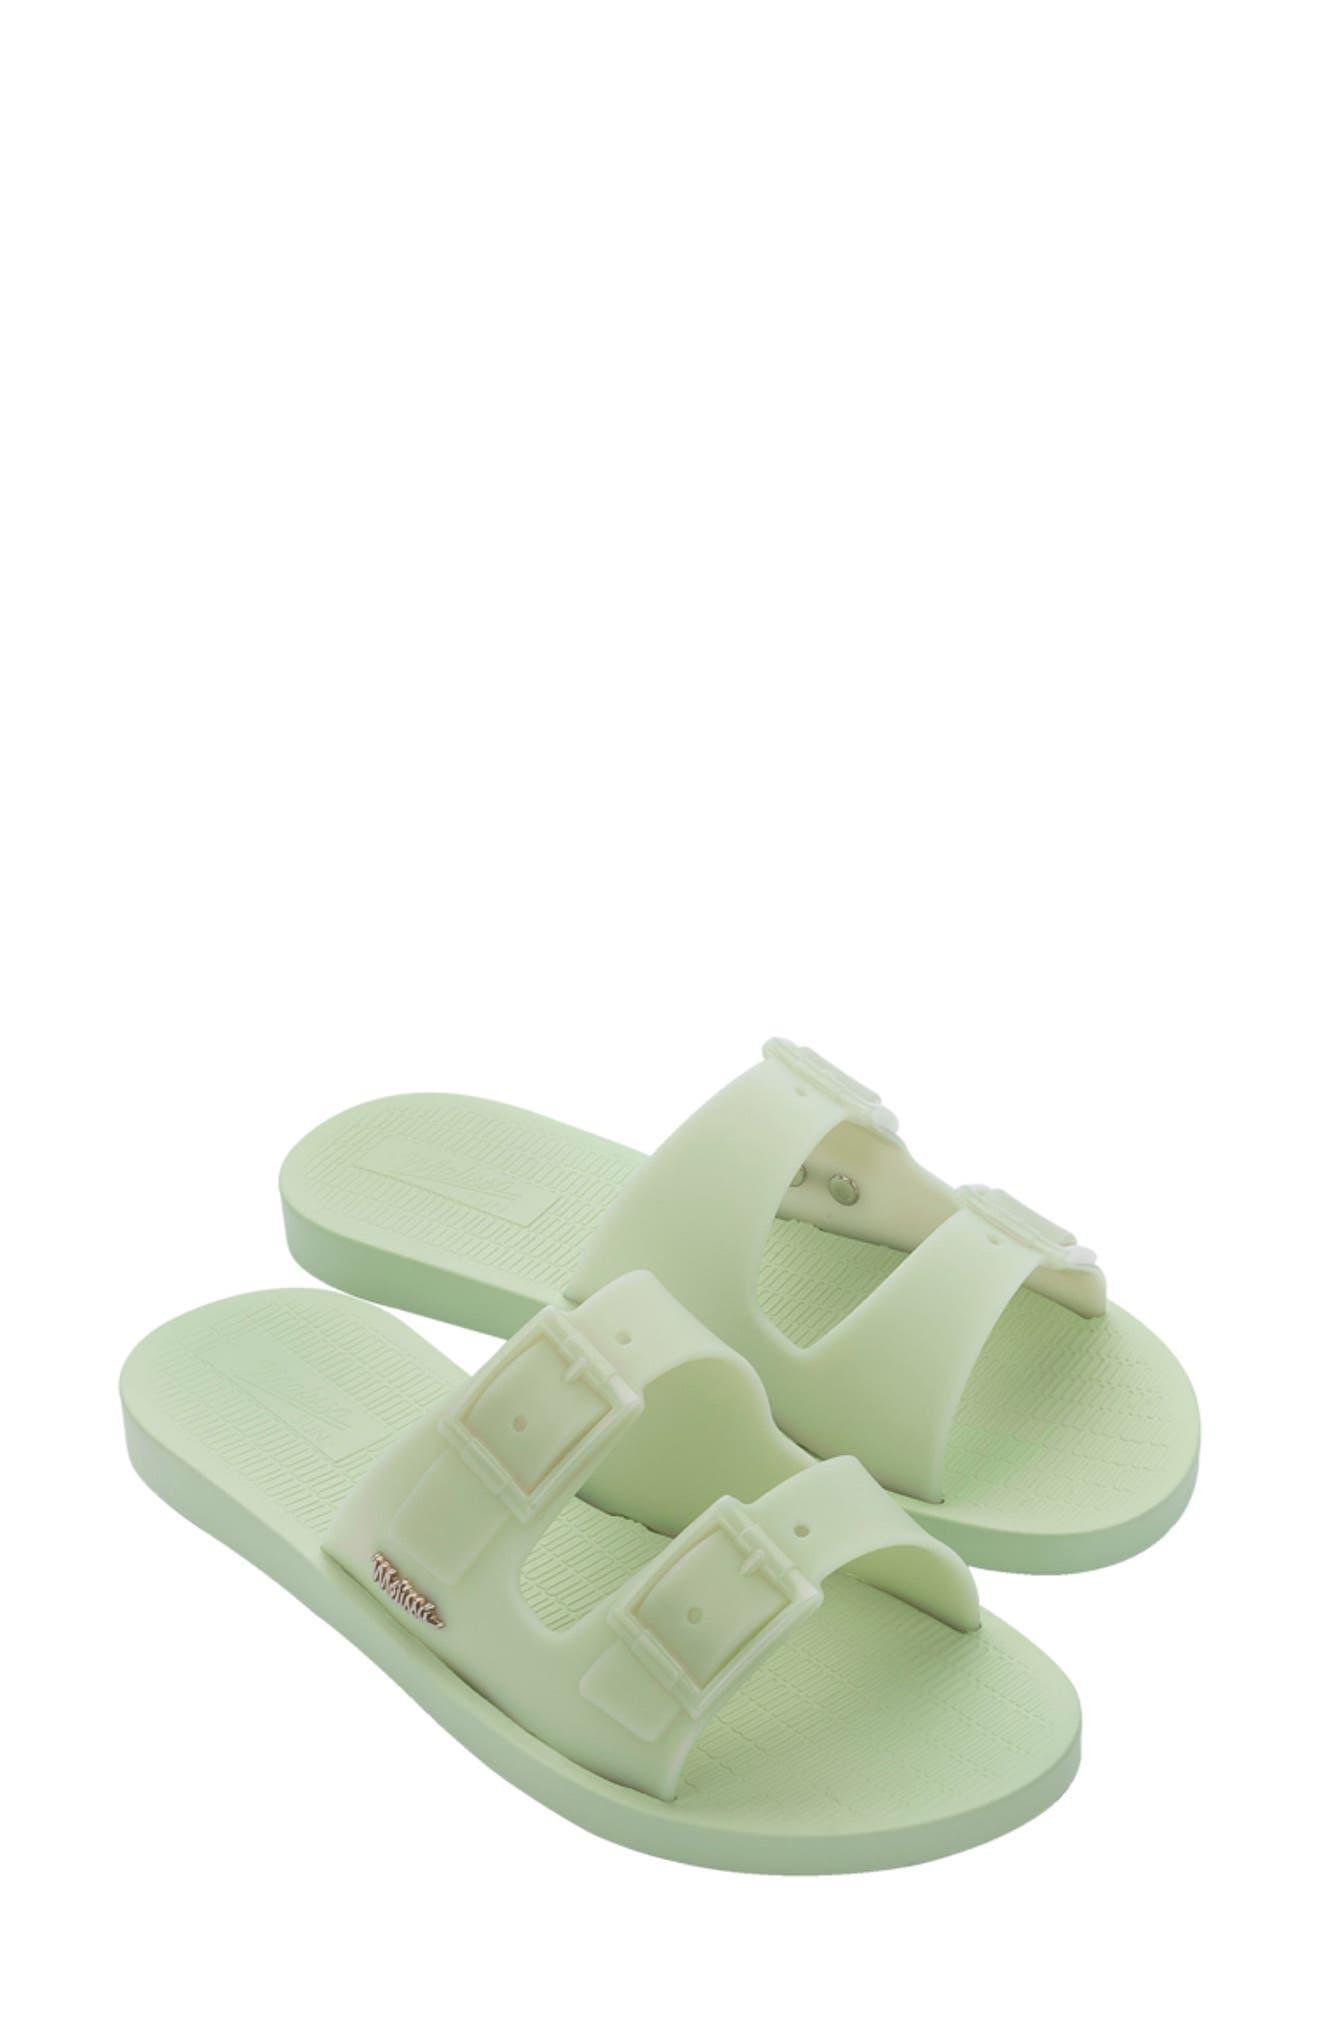 Sun Malibu Slide Sandal